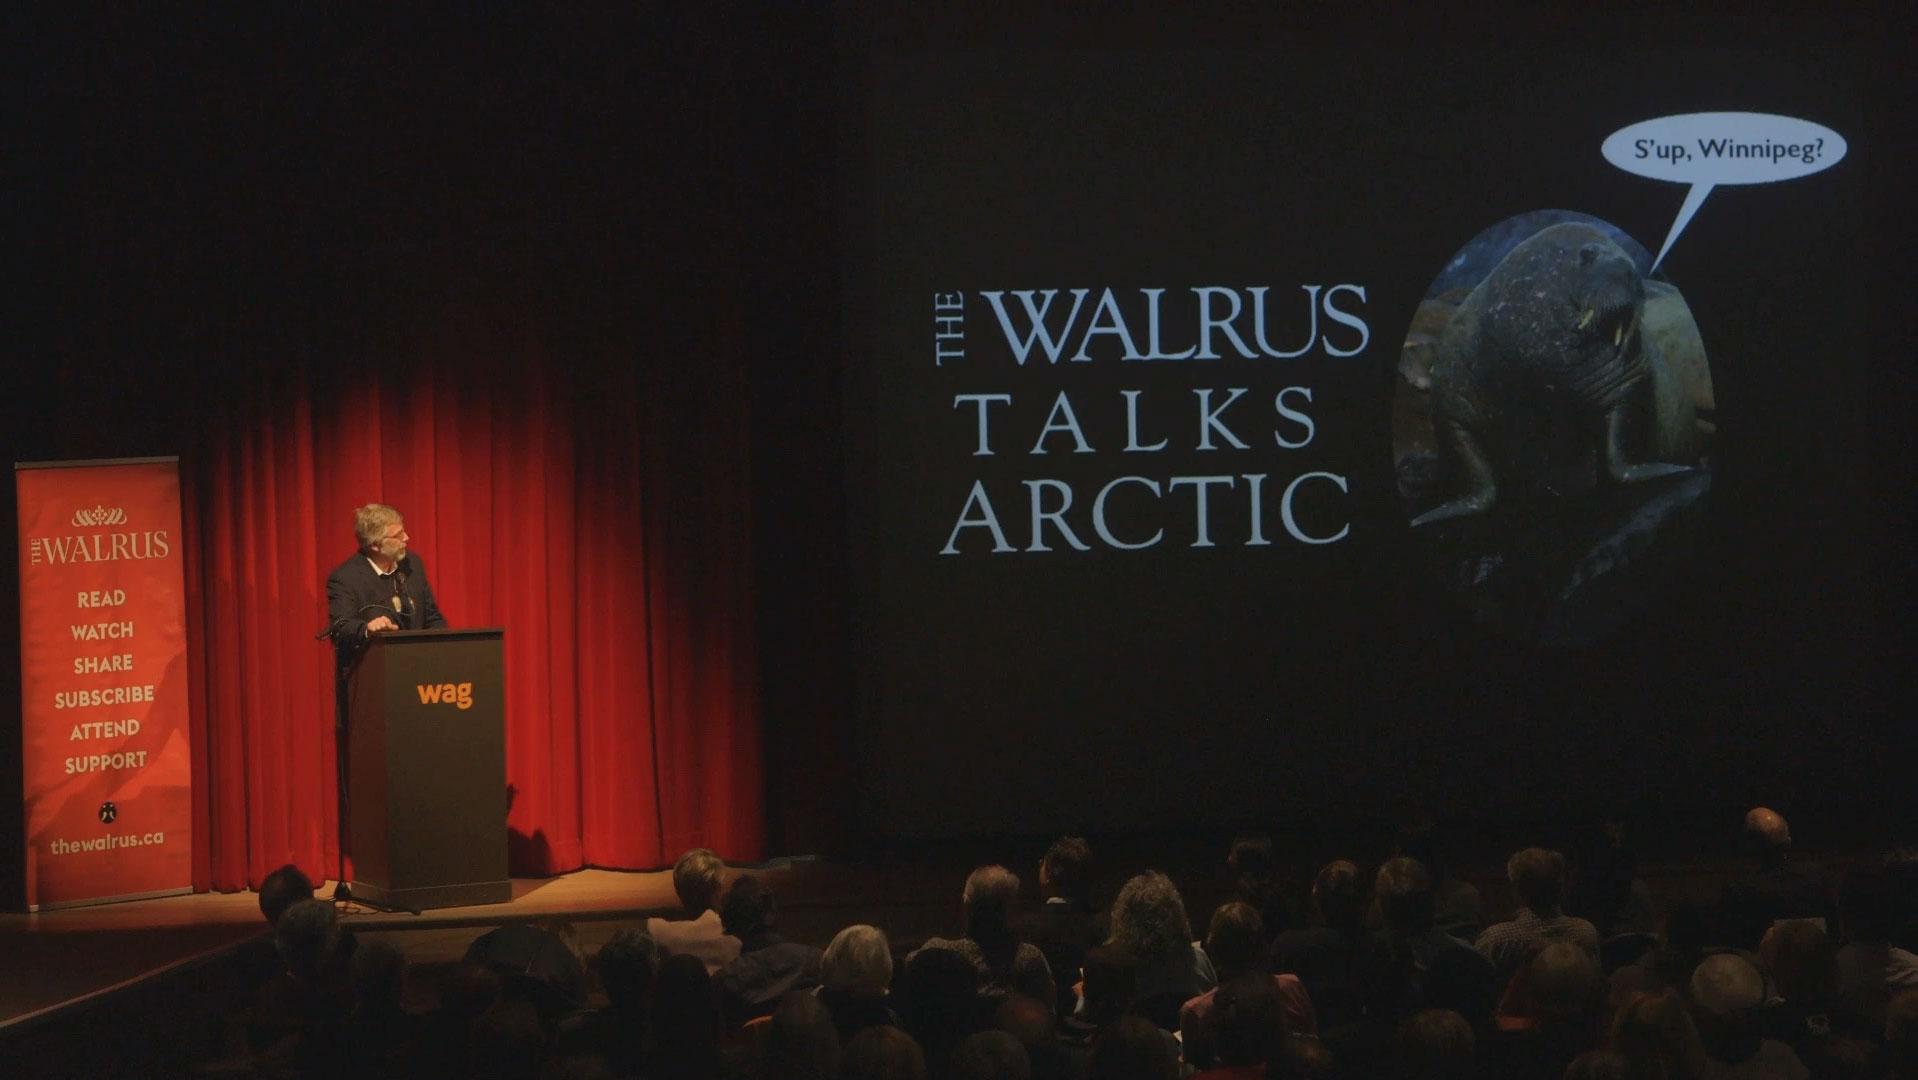 Video still of James Raffan from The Walrus Talks Arctic